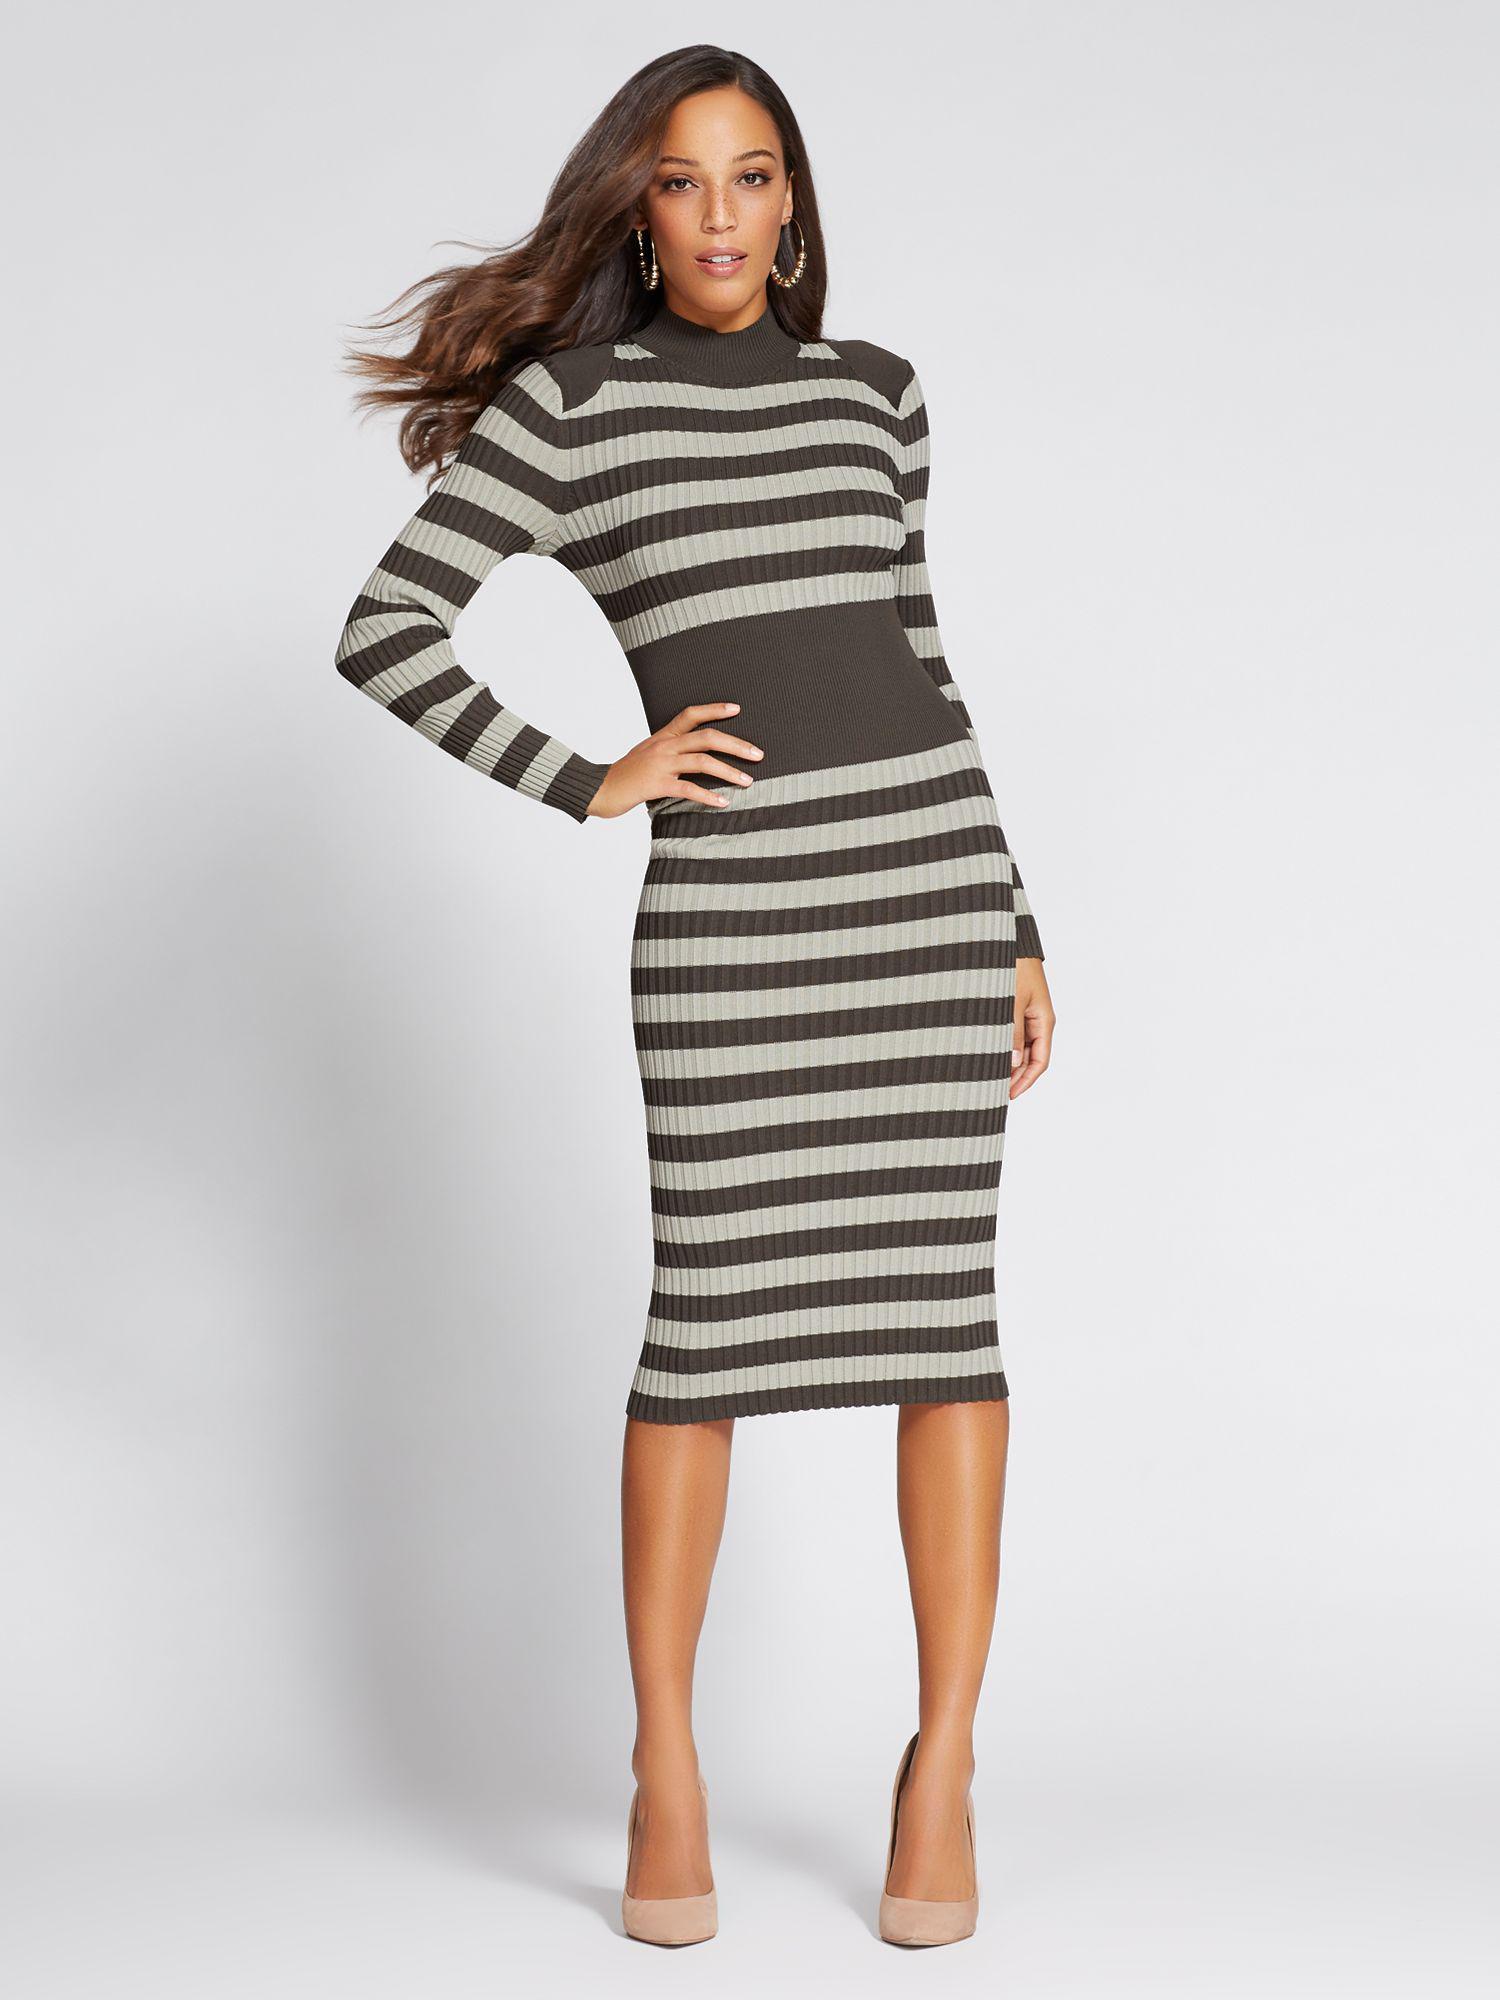 e33e1a31cfd New York & Company Black Gabrielle Union Collection - Mock-neck Sweater  Dress - Stripe